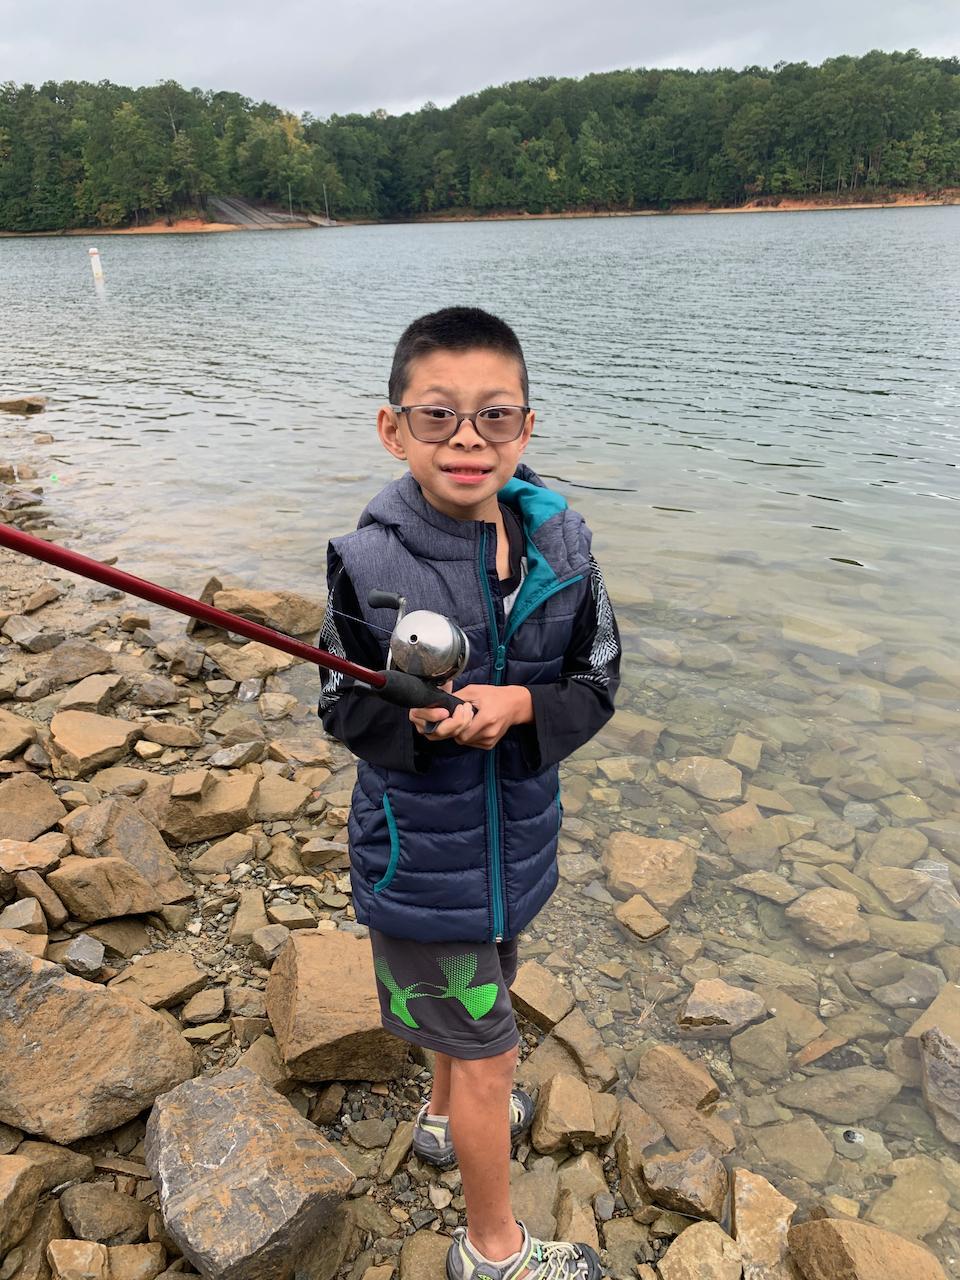 Little-Fisherman-Carters-Lake